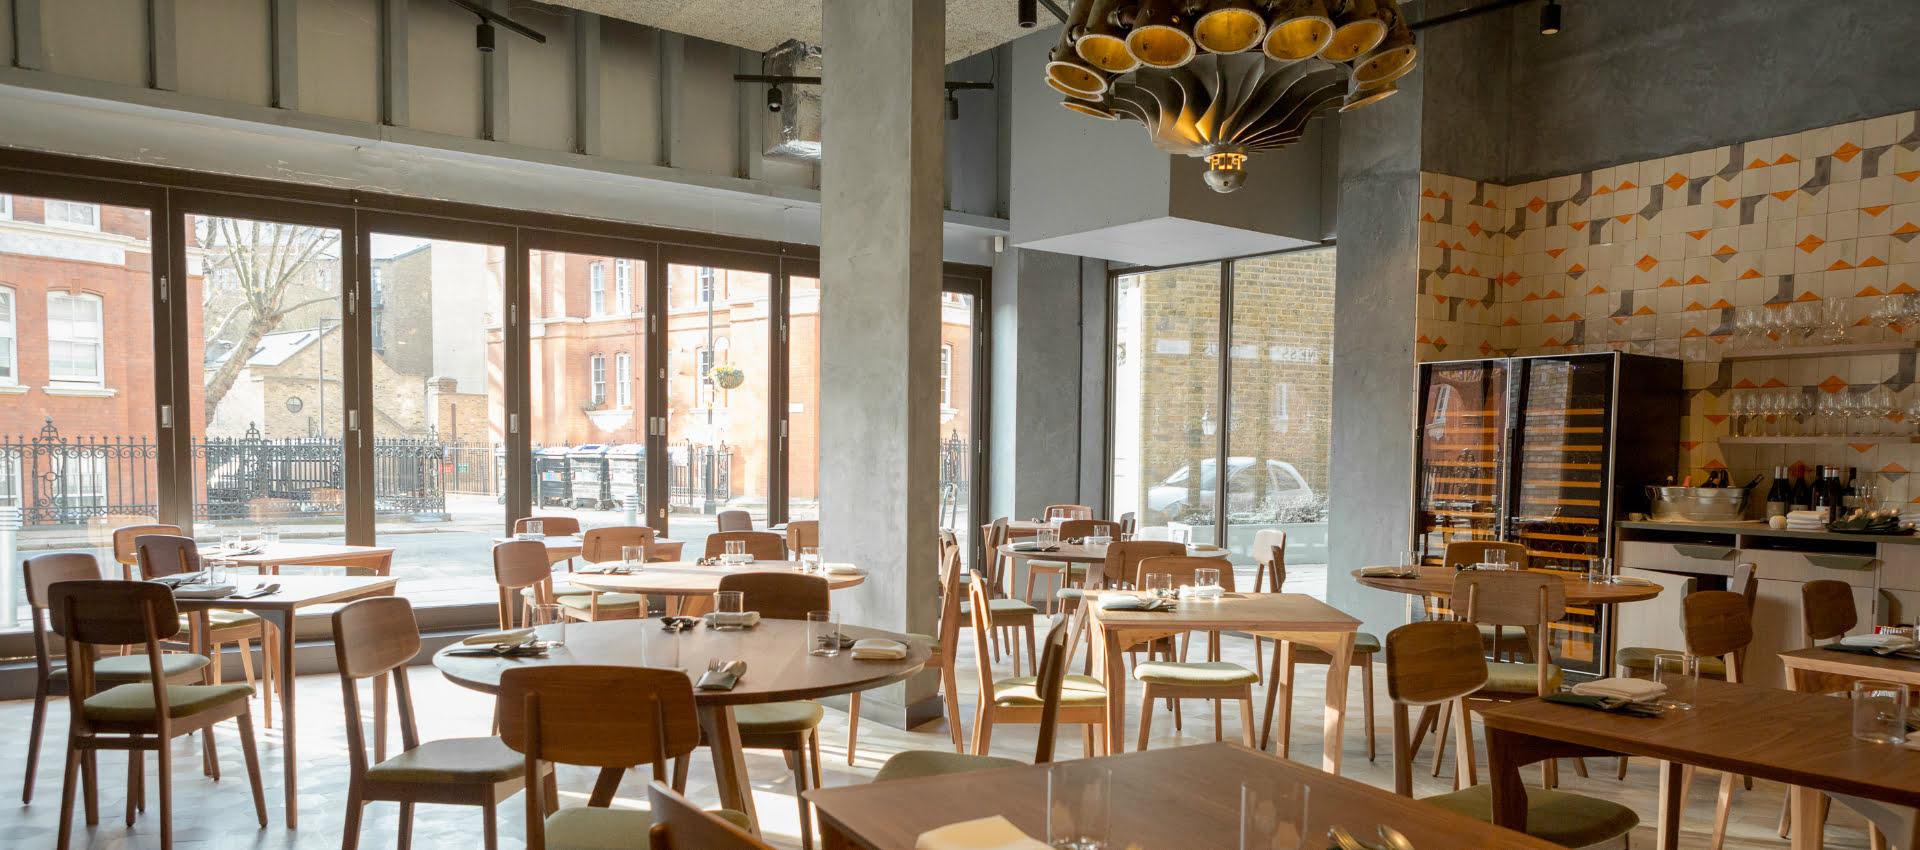 londrino former portuguese restaurant in southwark closed. Black Bedroom Furniture Sets. Home Design Ideas